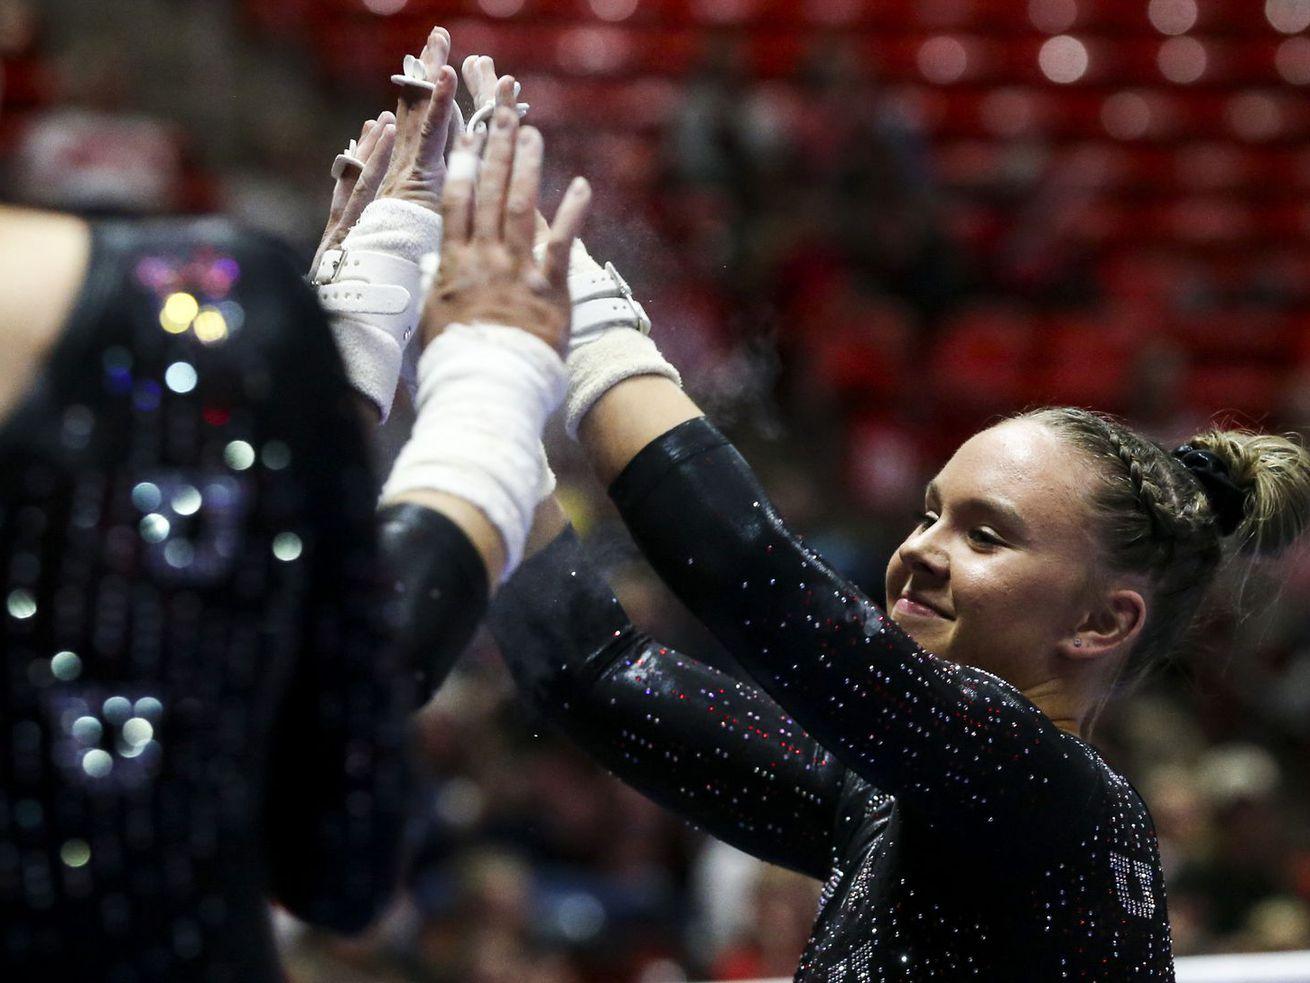 'Stunner' of a beam routine earns Utah gymnastics' Maile O'Keefe Pac-12 Freshman of the Week honors